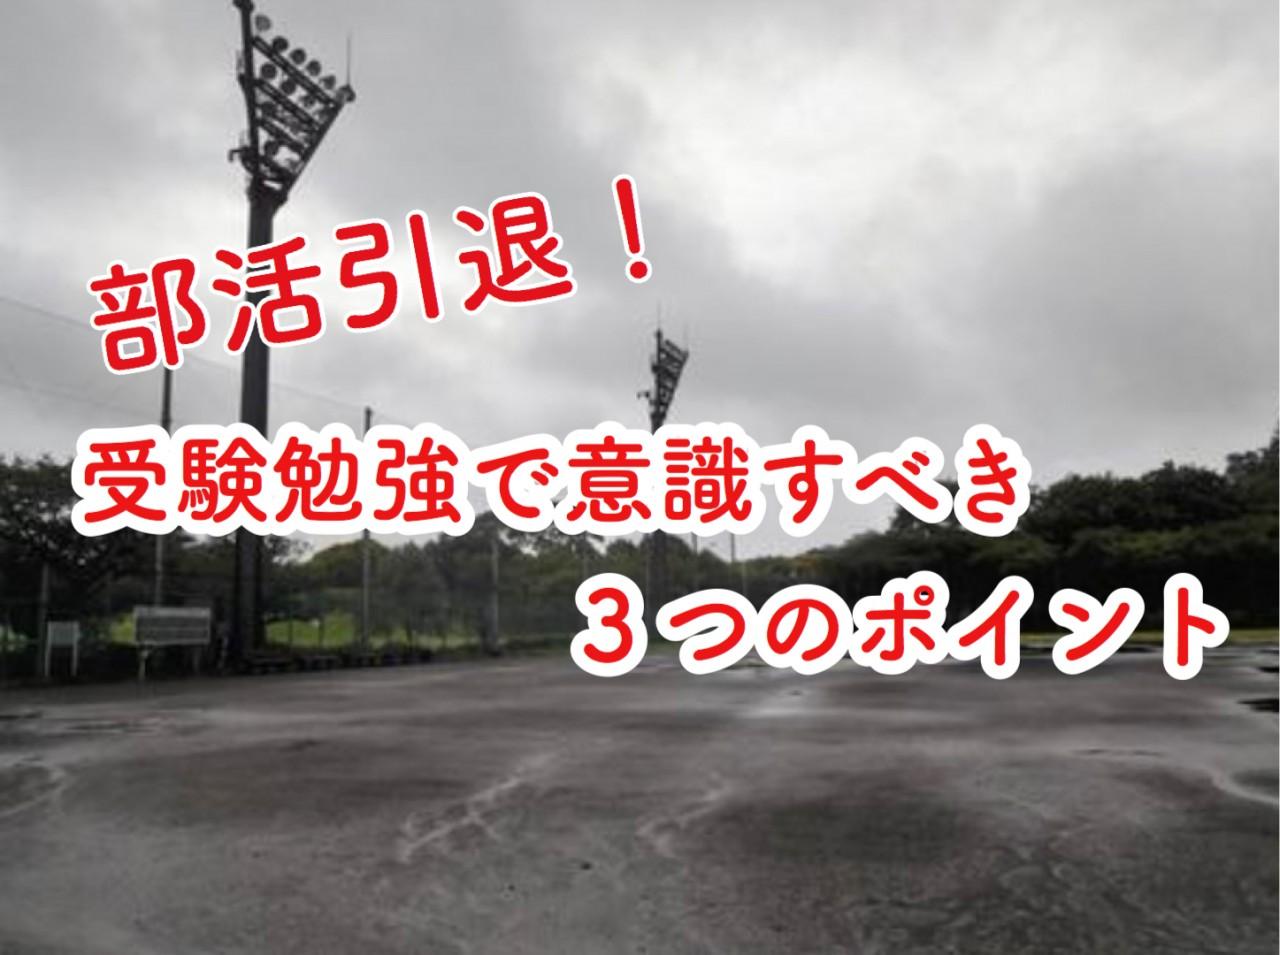 ブログ用画像(部活引退)